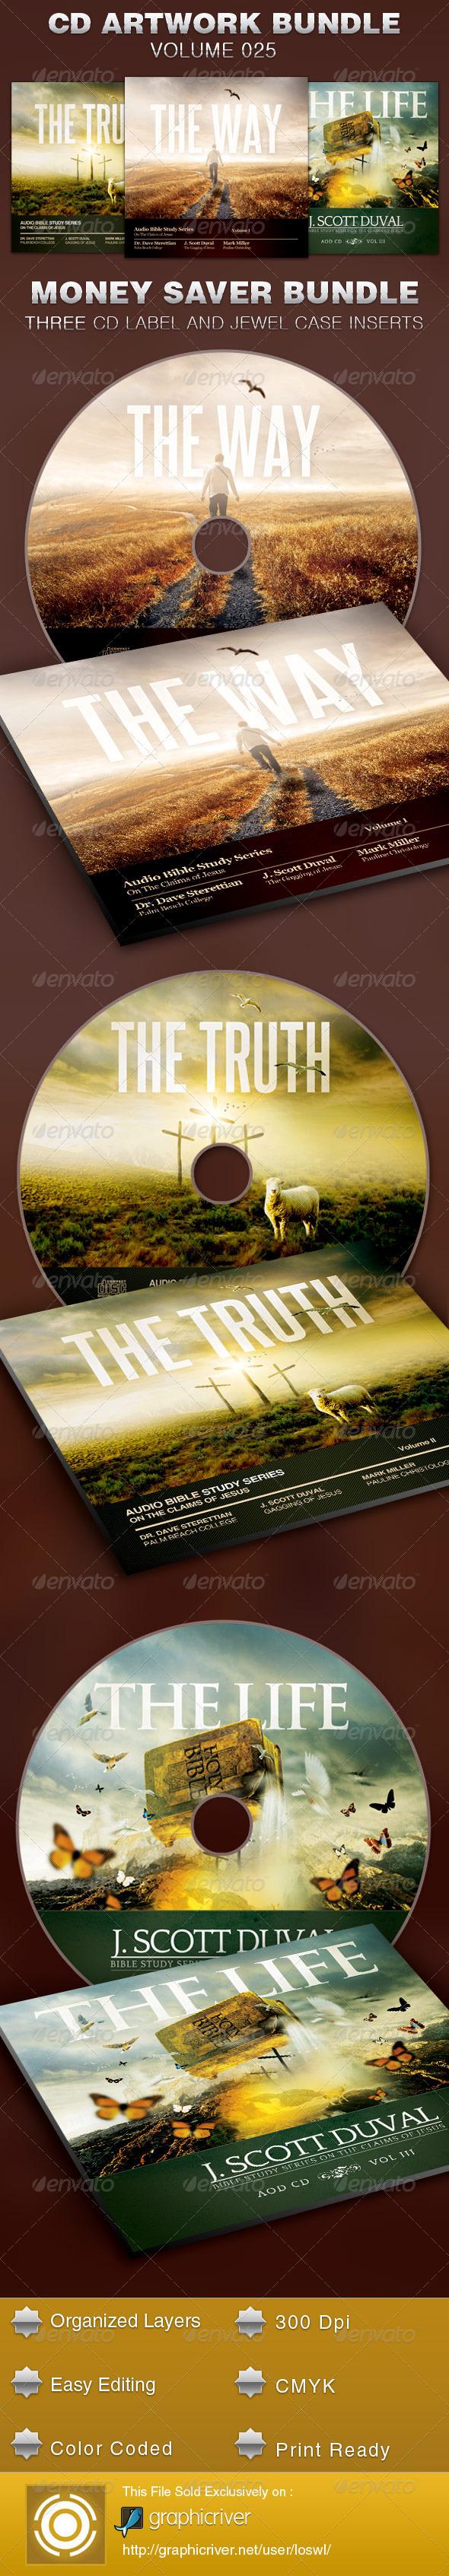 GraphicRiver CD Cover Artwork Template Bundle-Vol 025 5423765